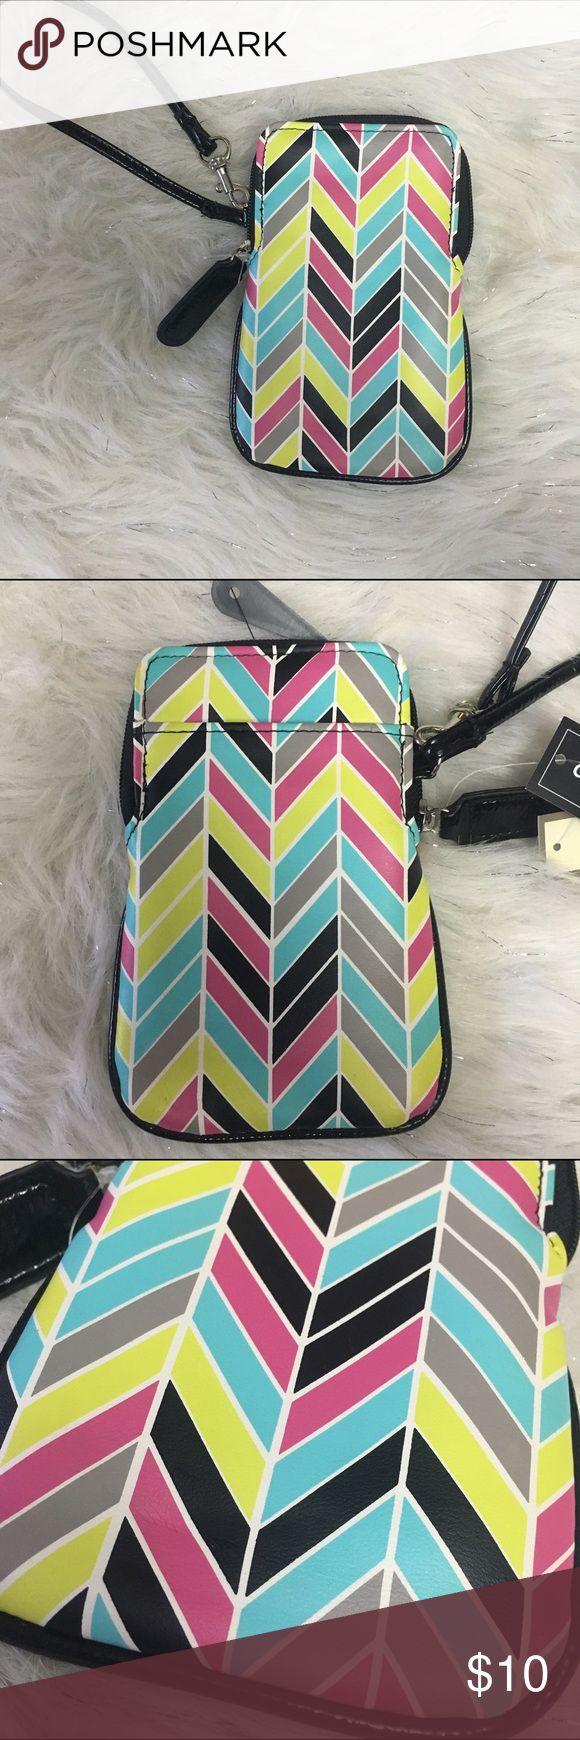 "Blue pink yellow chevron phone case wallet wrist Wallet wristlet phone case. Chevron print faux leather 6"" long 3.5""-4"" wide bu Bags Wallets"